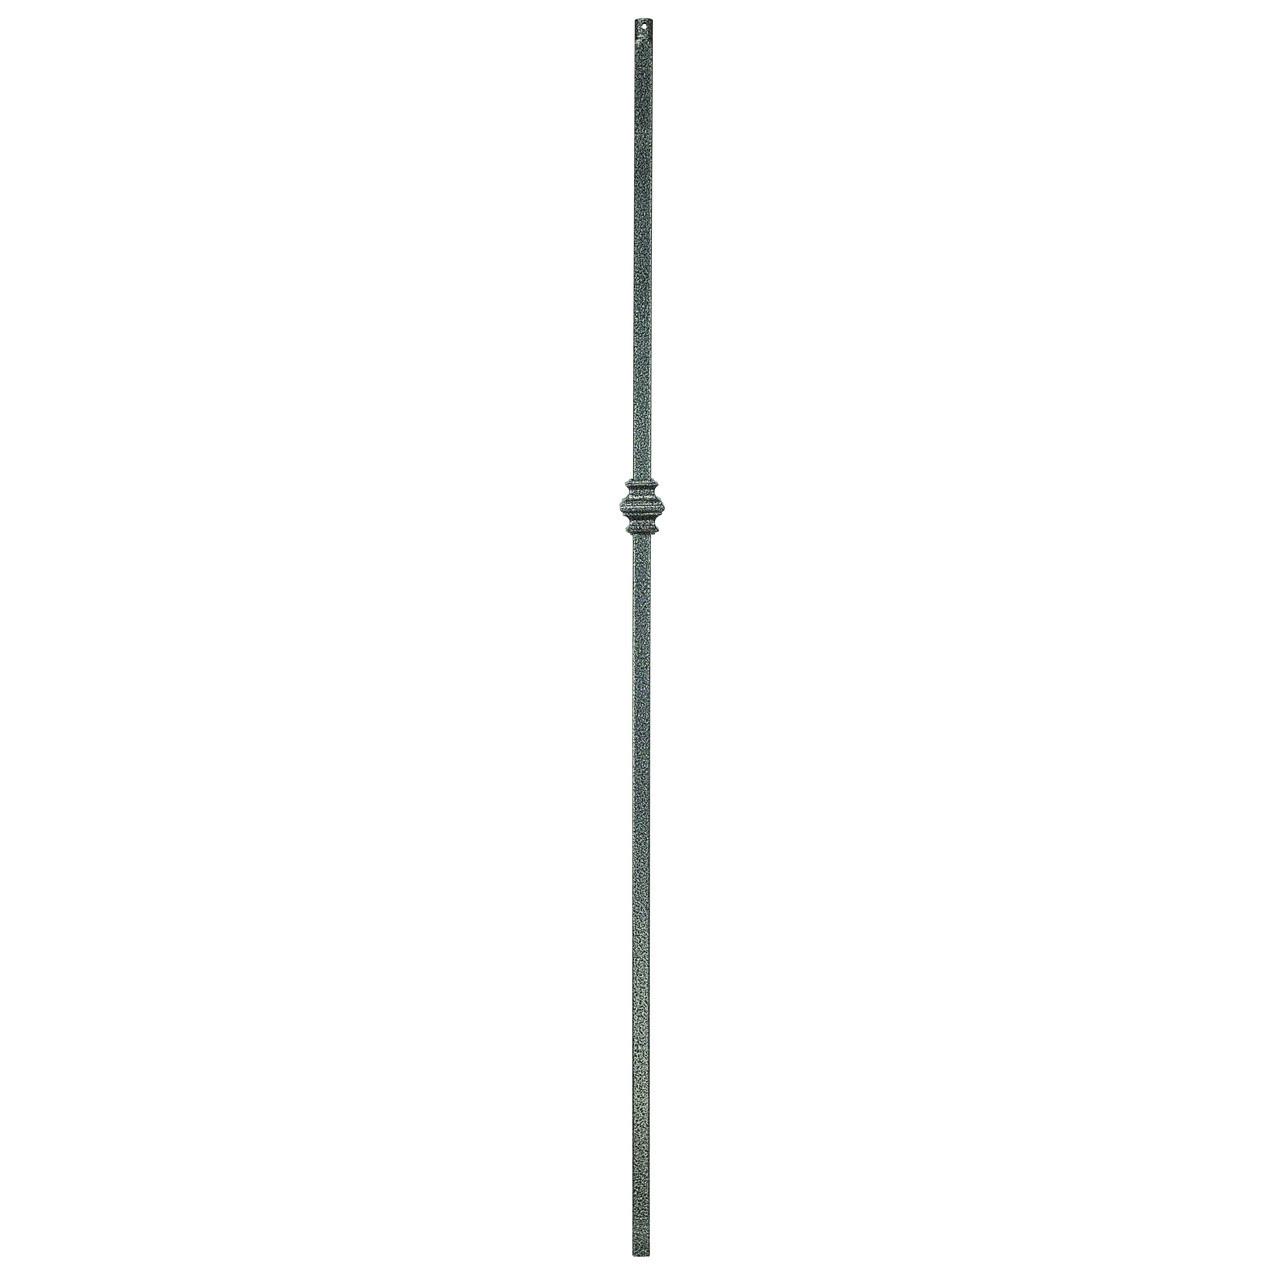 2G60 16mm Single Knuckle, Tubular Steel